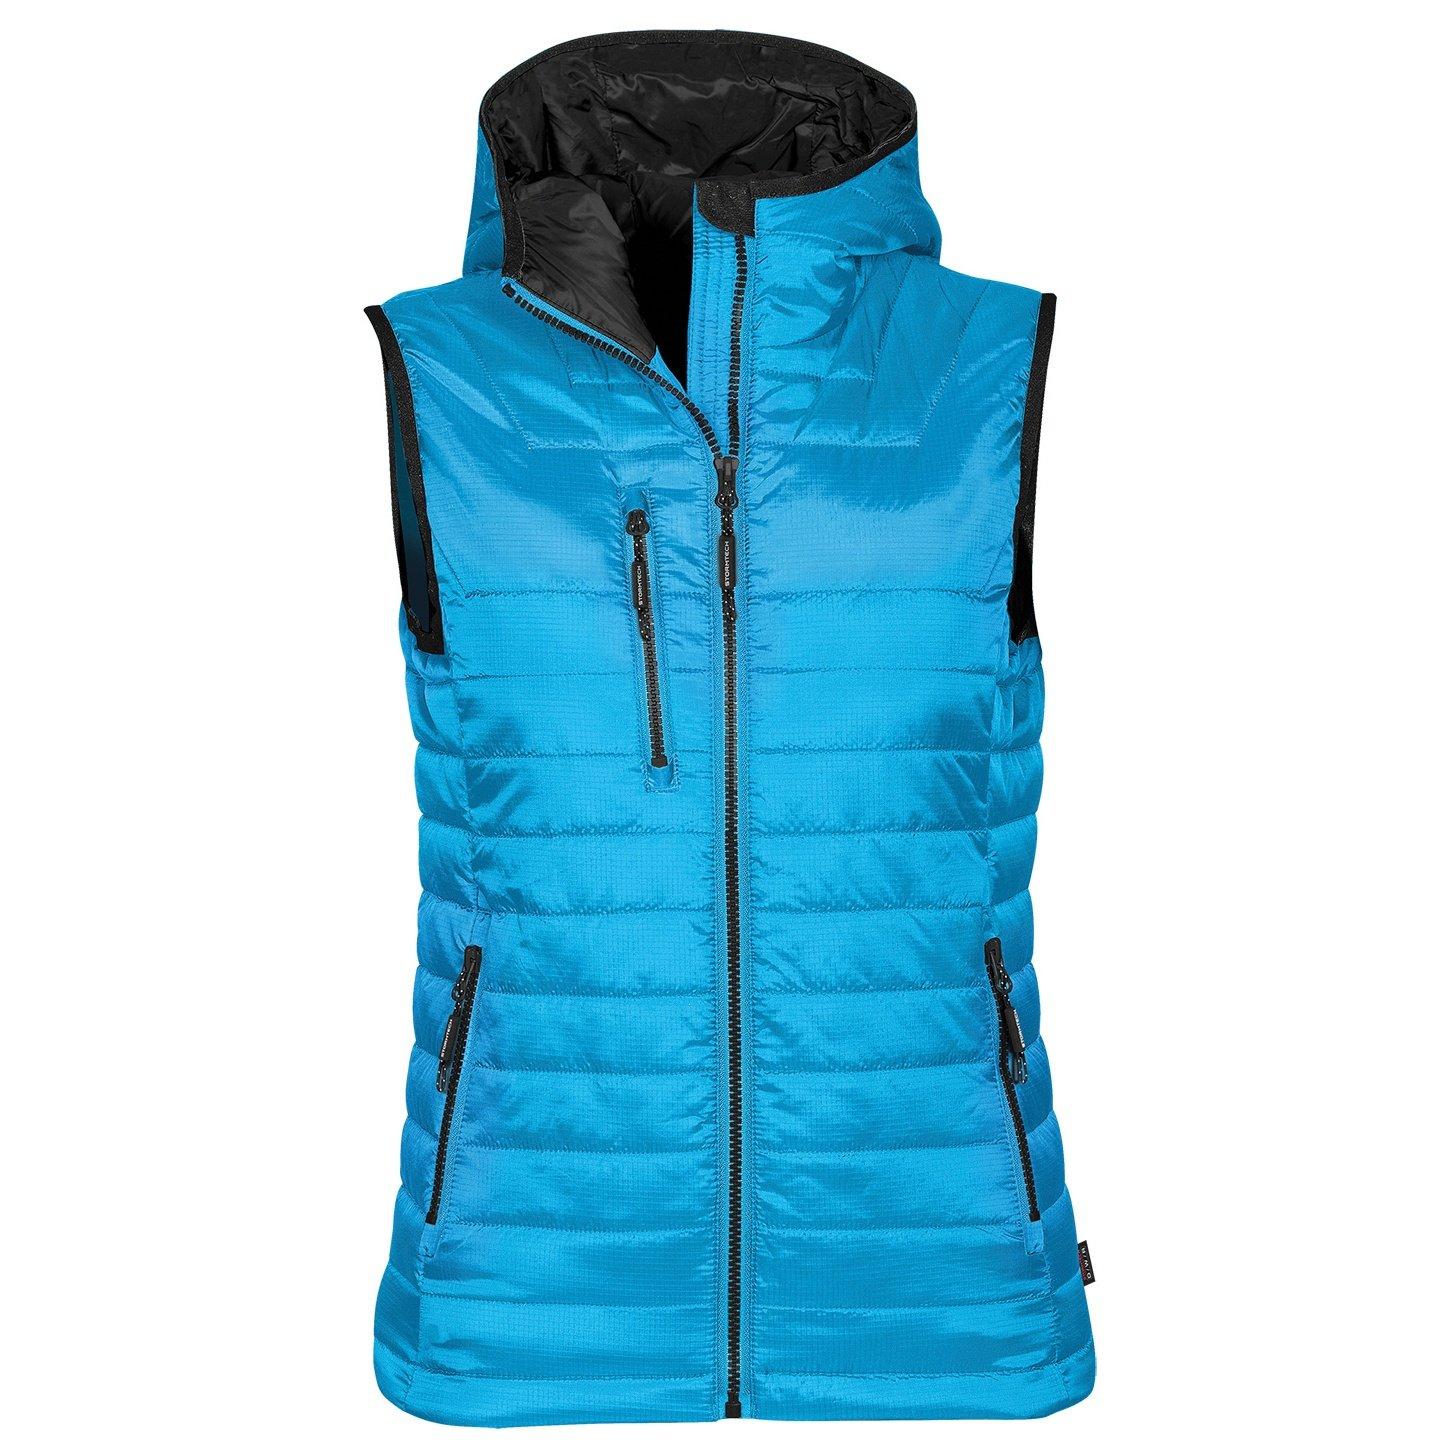 Stormtech Womens gravity thermal vest H-RALA2015-ST806